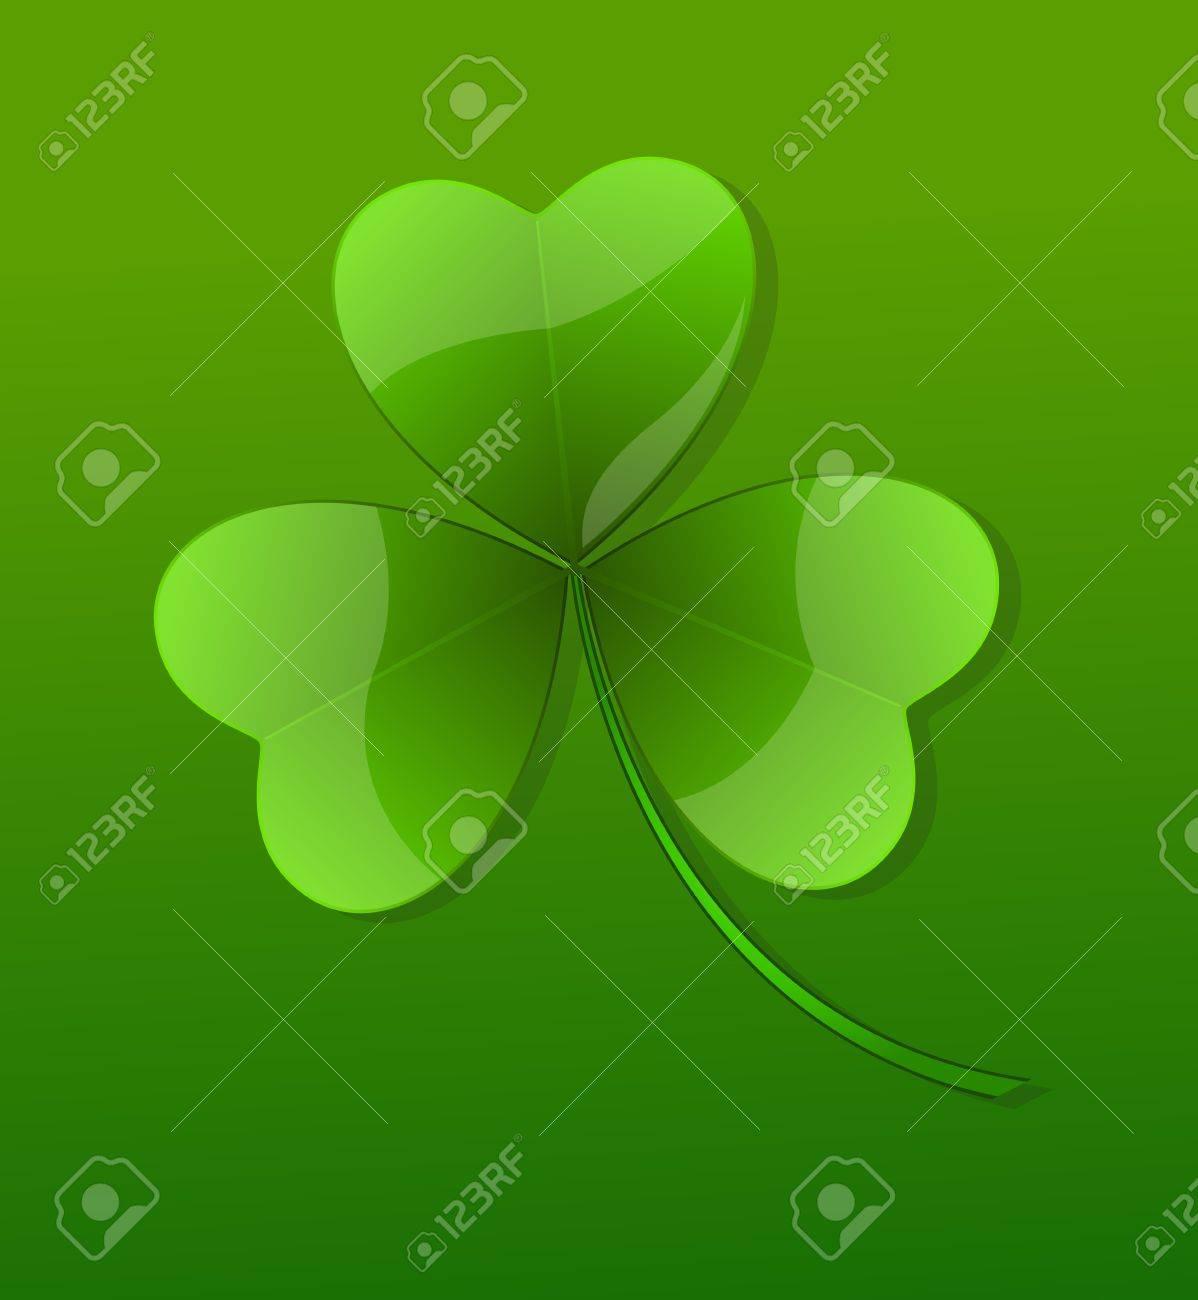 Green Glossy Shamrock Stock Vector - 12654447